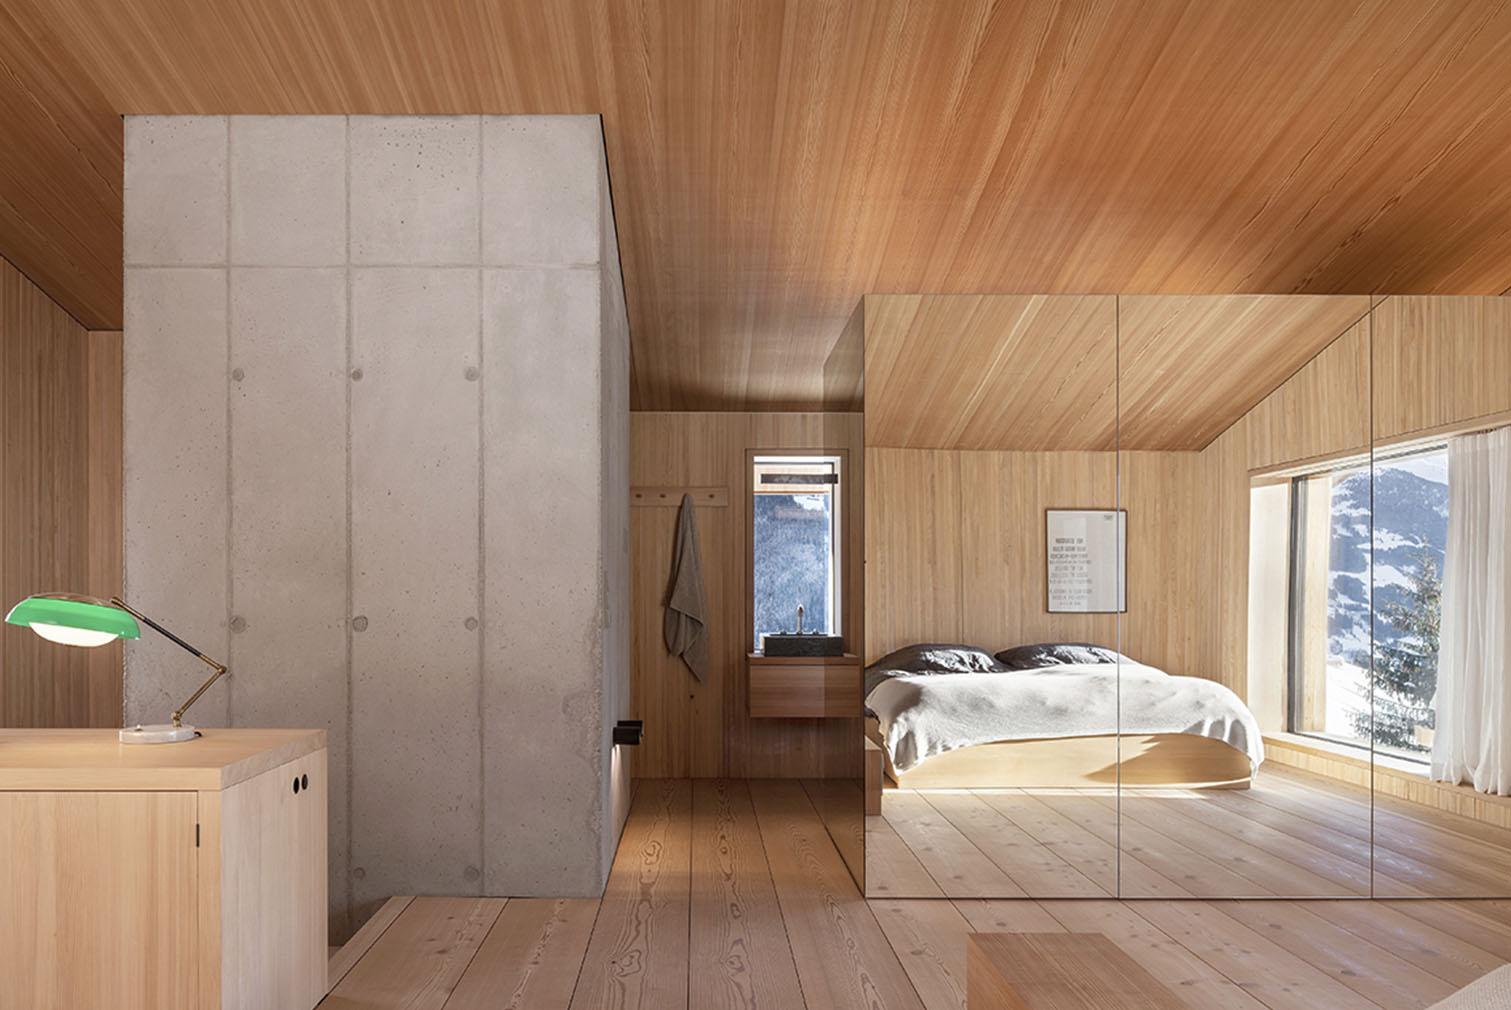 Interiors of Turmhaus Tirol in the Tyrolean Alps